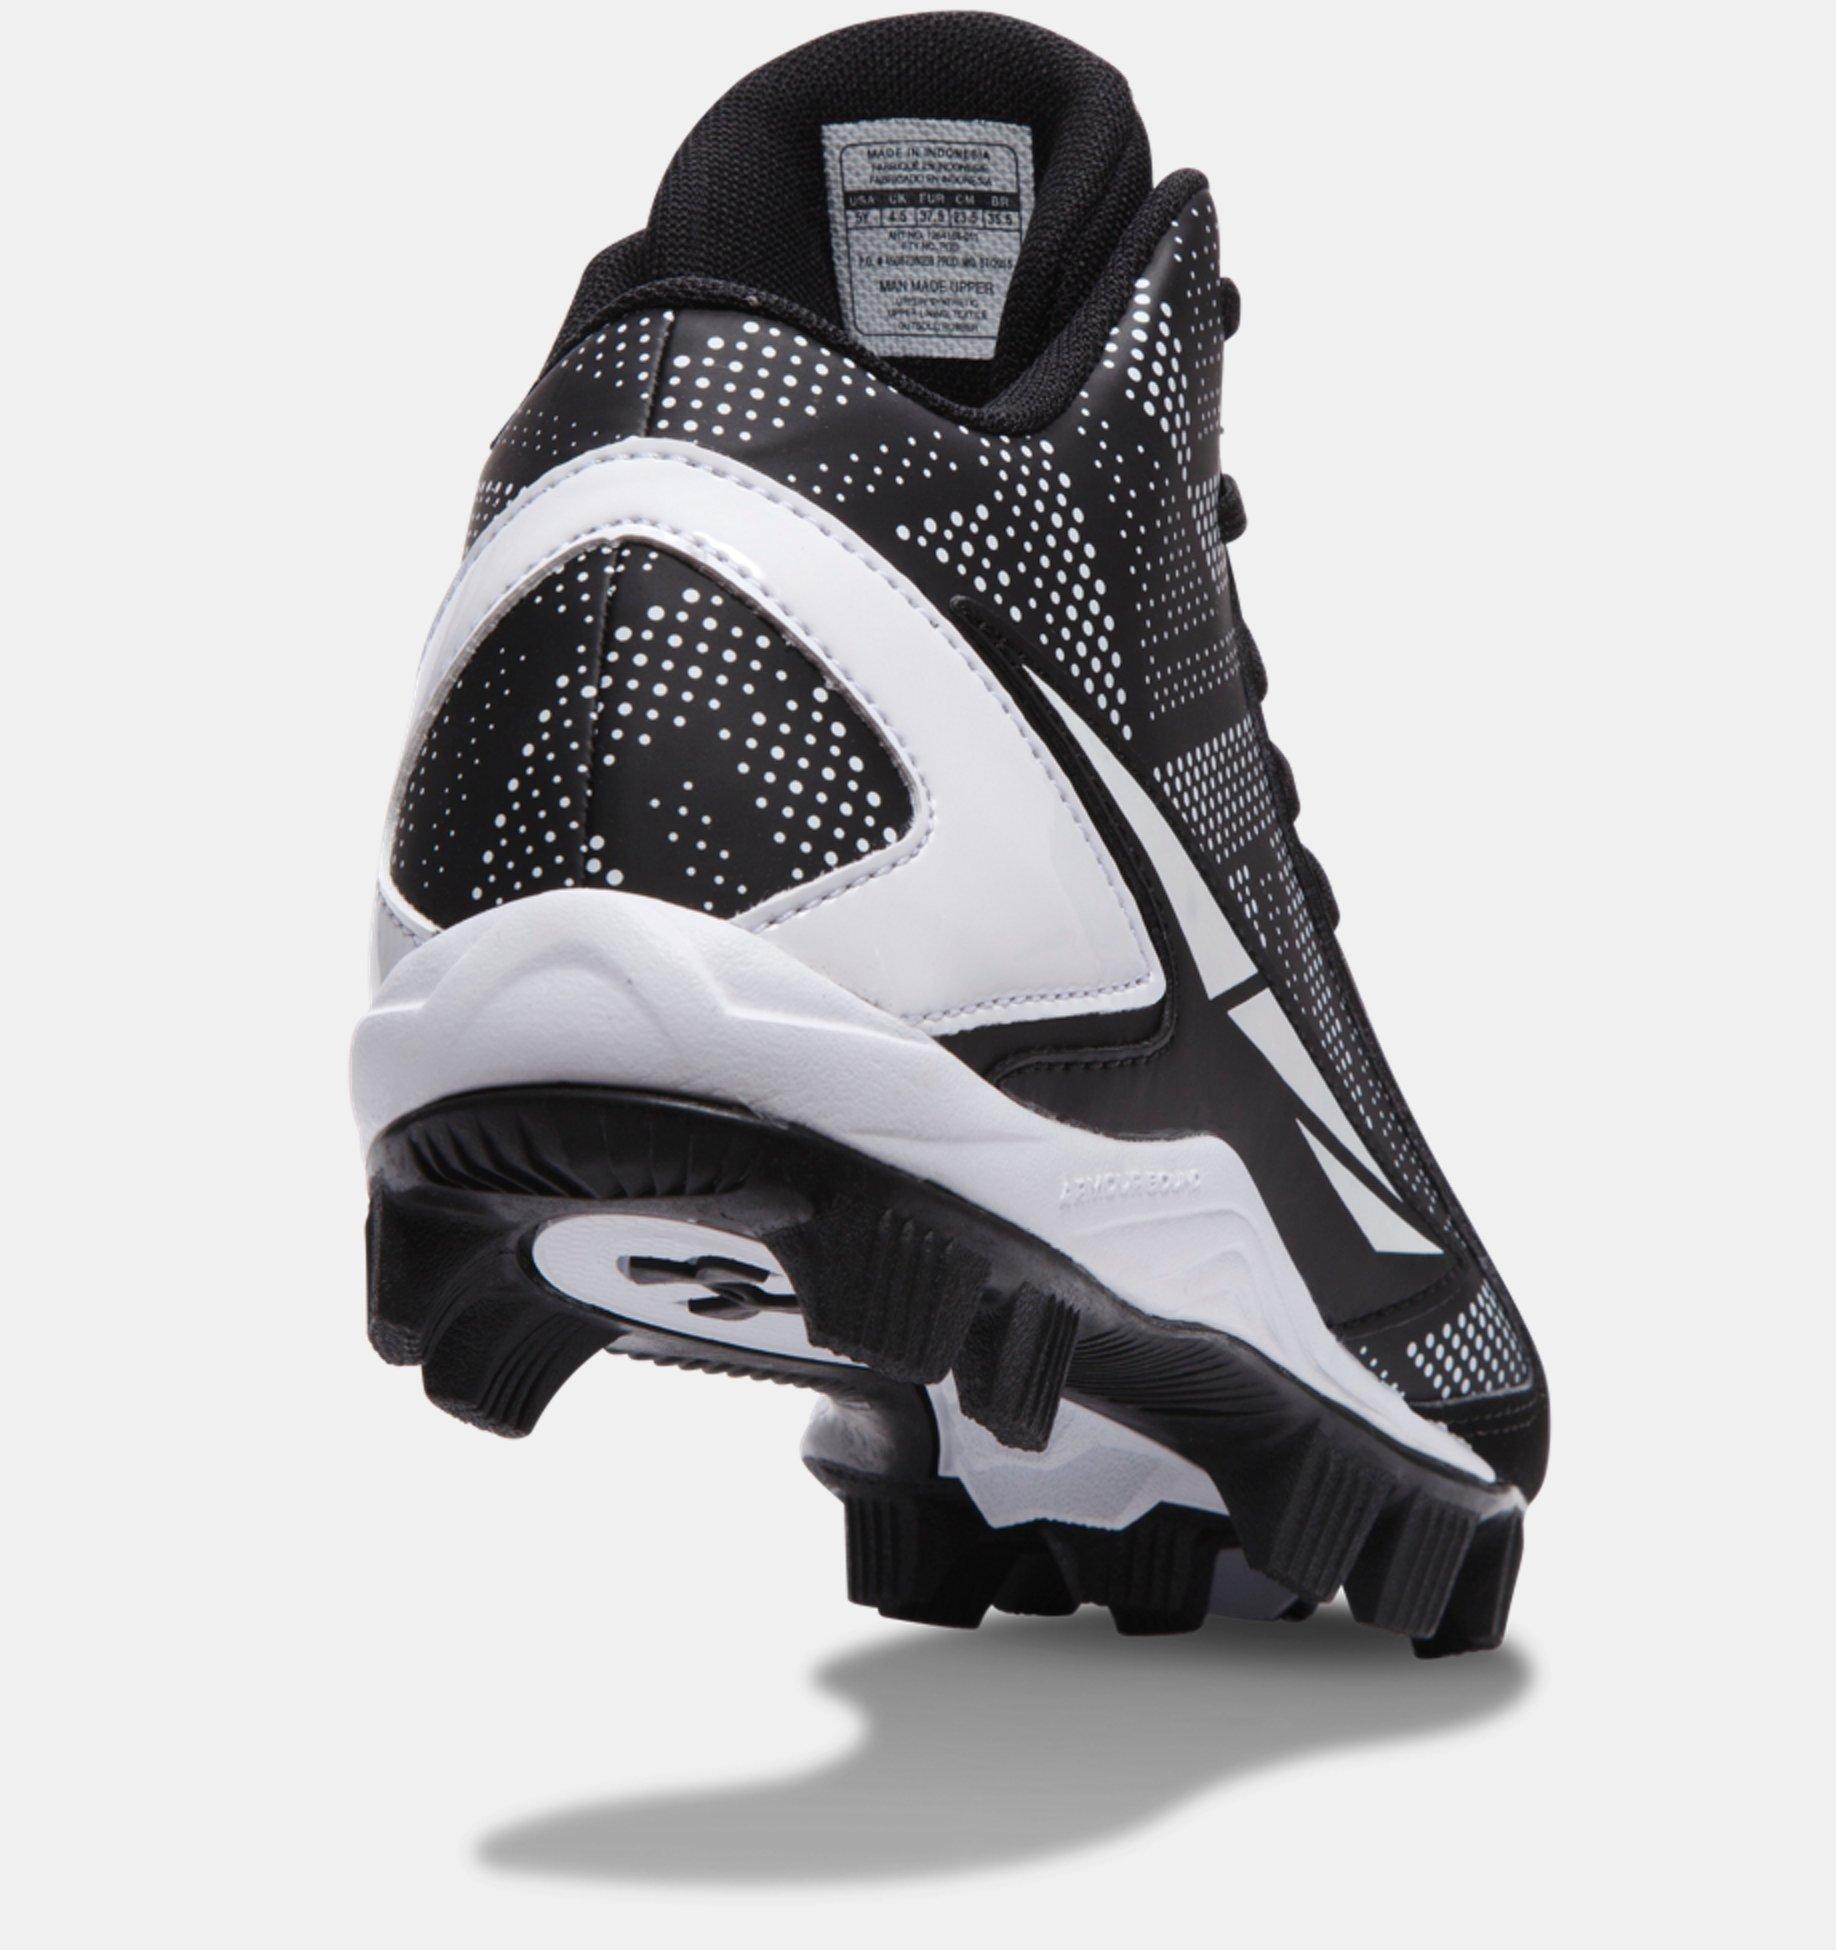 ... Zapato para béisbol mediano Jr. UA Leadoff para niño 6099549d5556